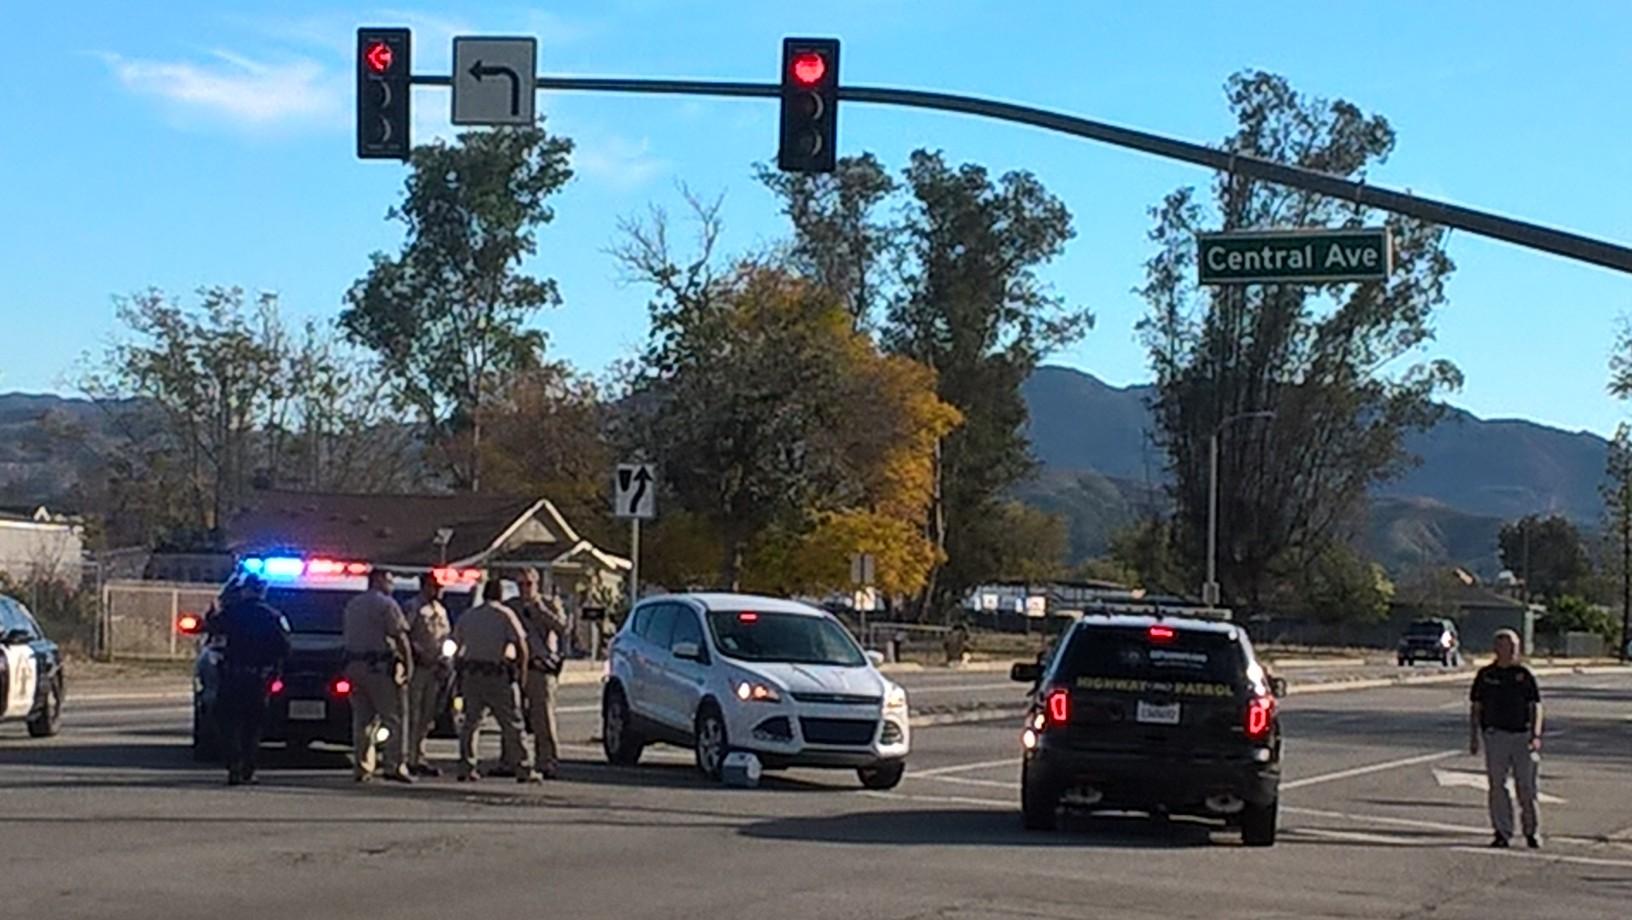 Scene of the shooting in San Bernardino, California